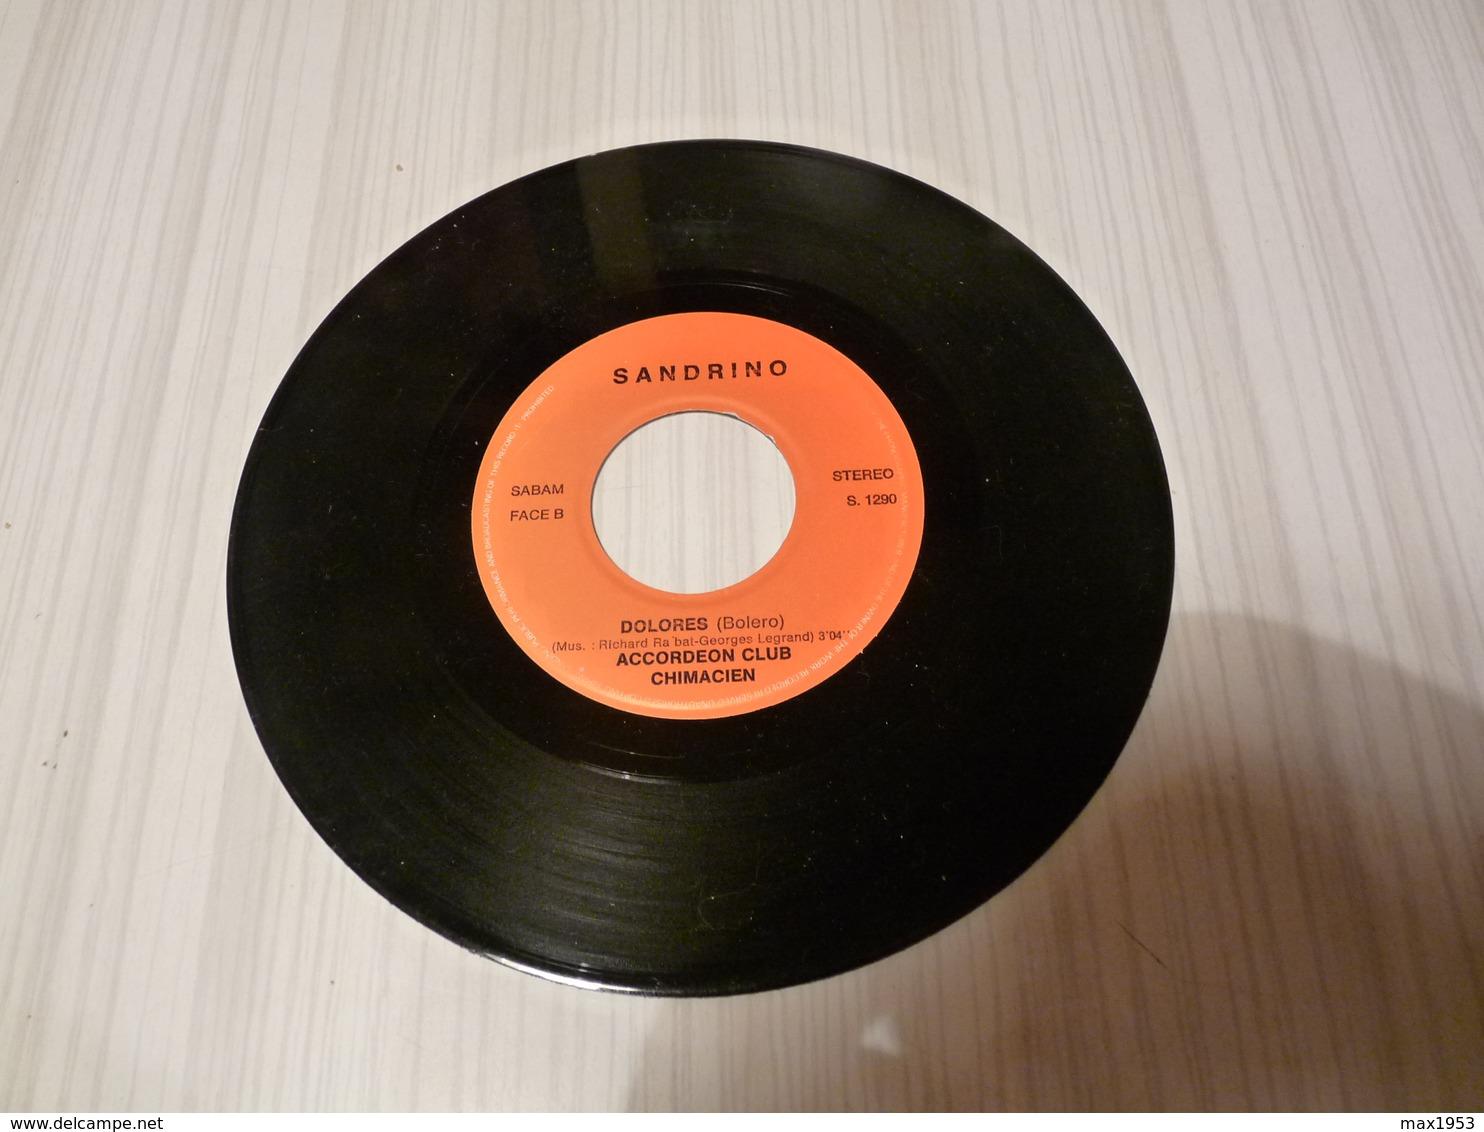 CHIMAY - Accordeonclub Chimacien - VENEZIA-DOLORES - Production Sandrino  S1290 - Vinyles